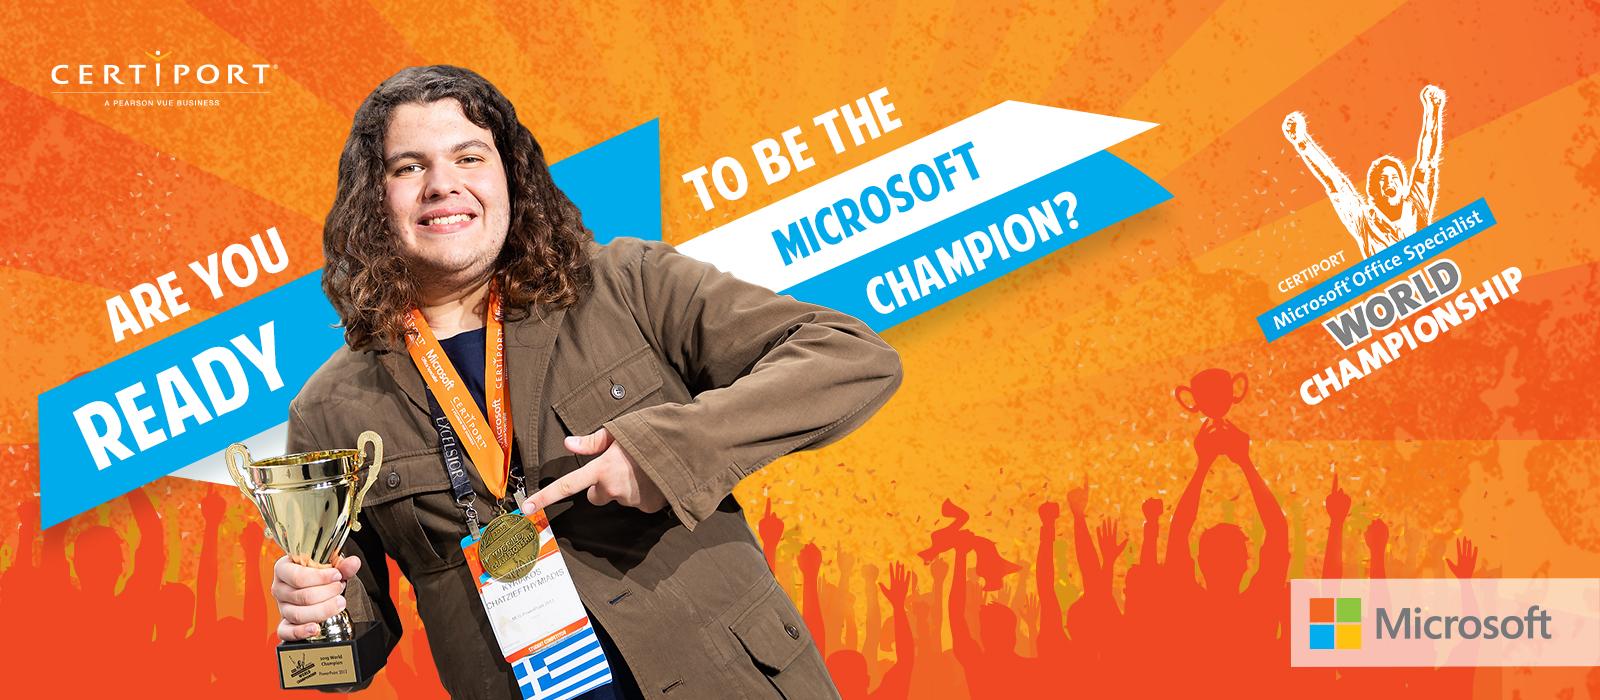 Microsoft Office Specialist World Championship New York, New York